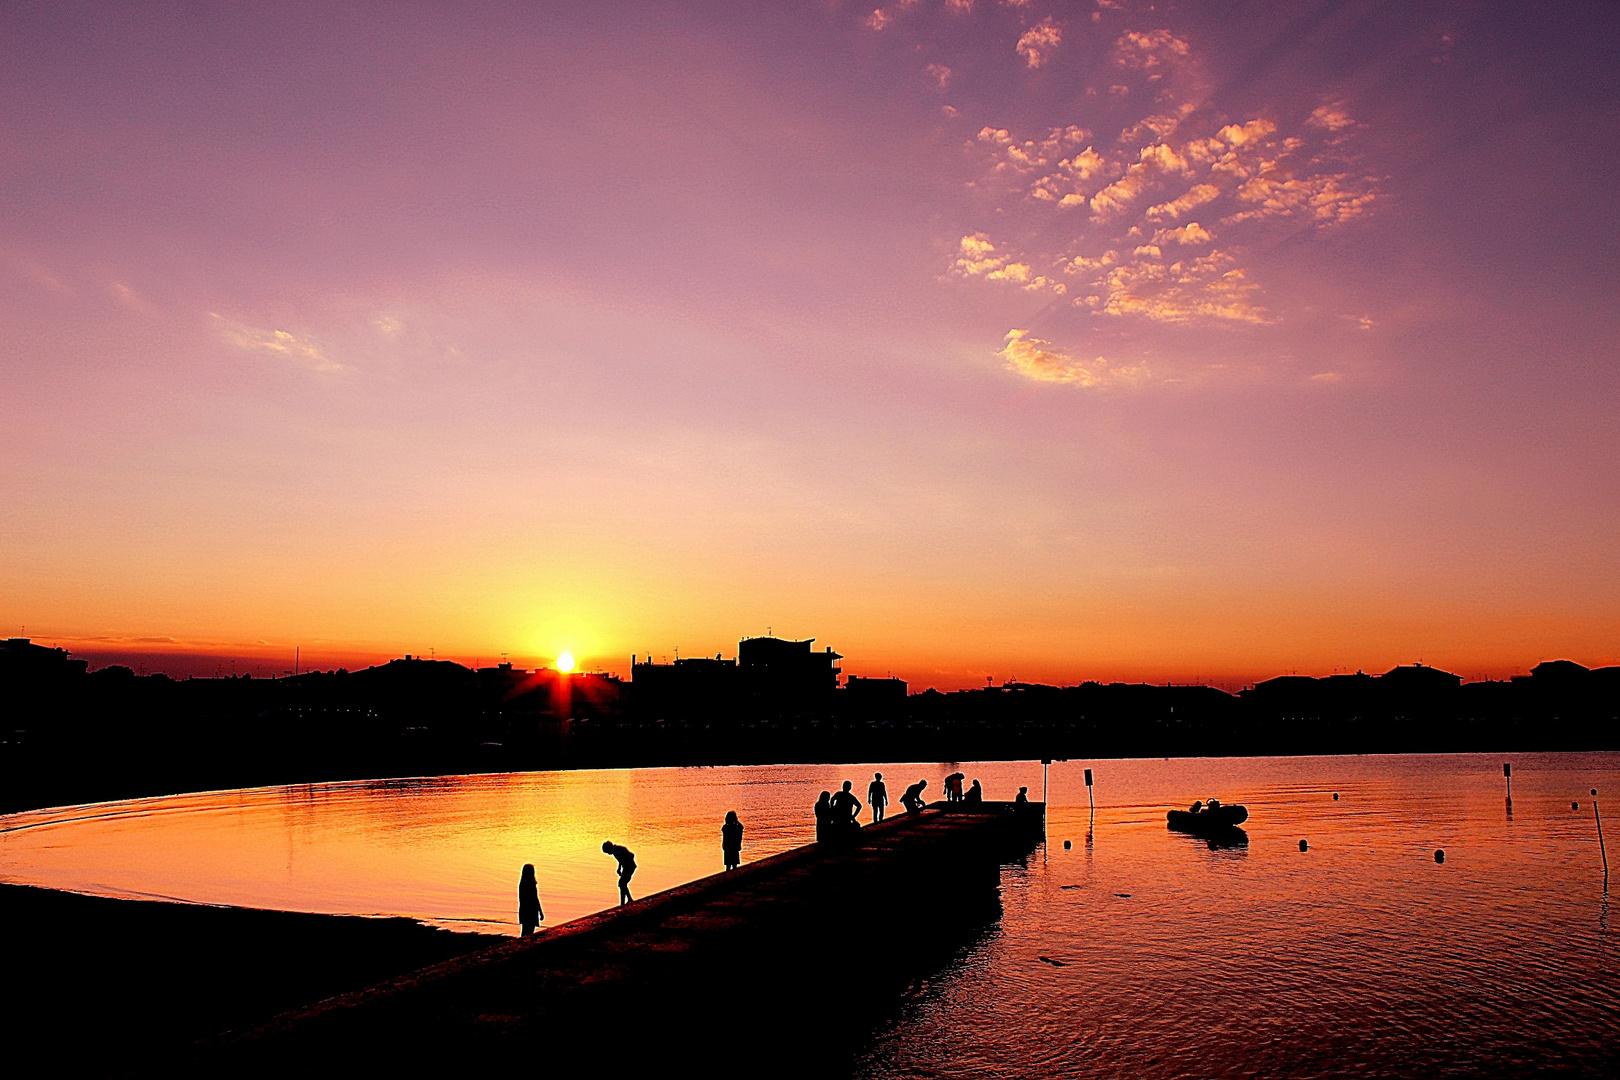 Sunset Caorle